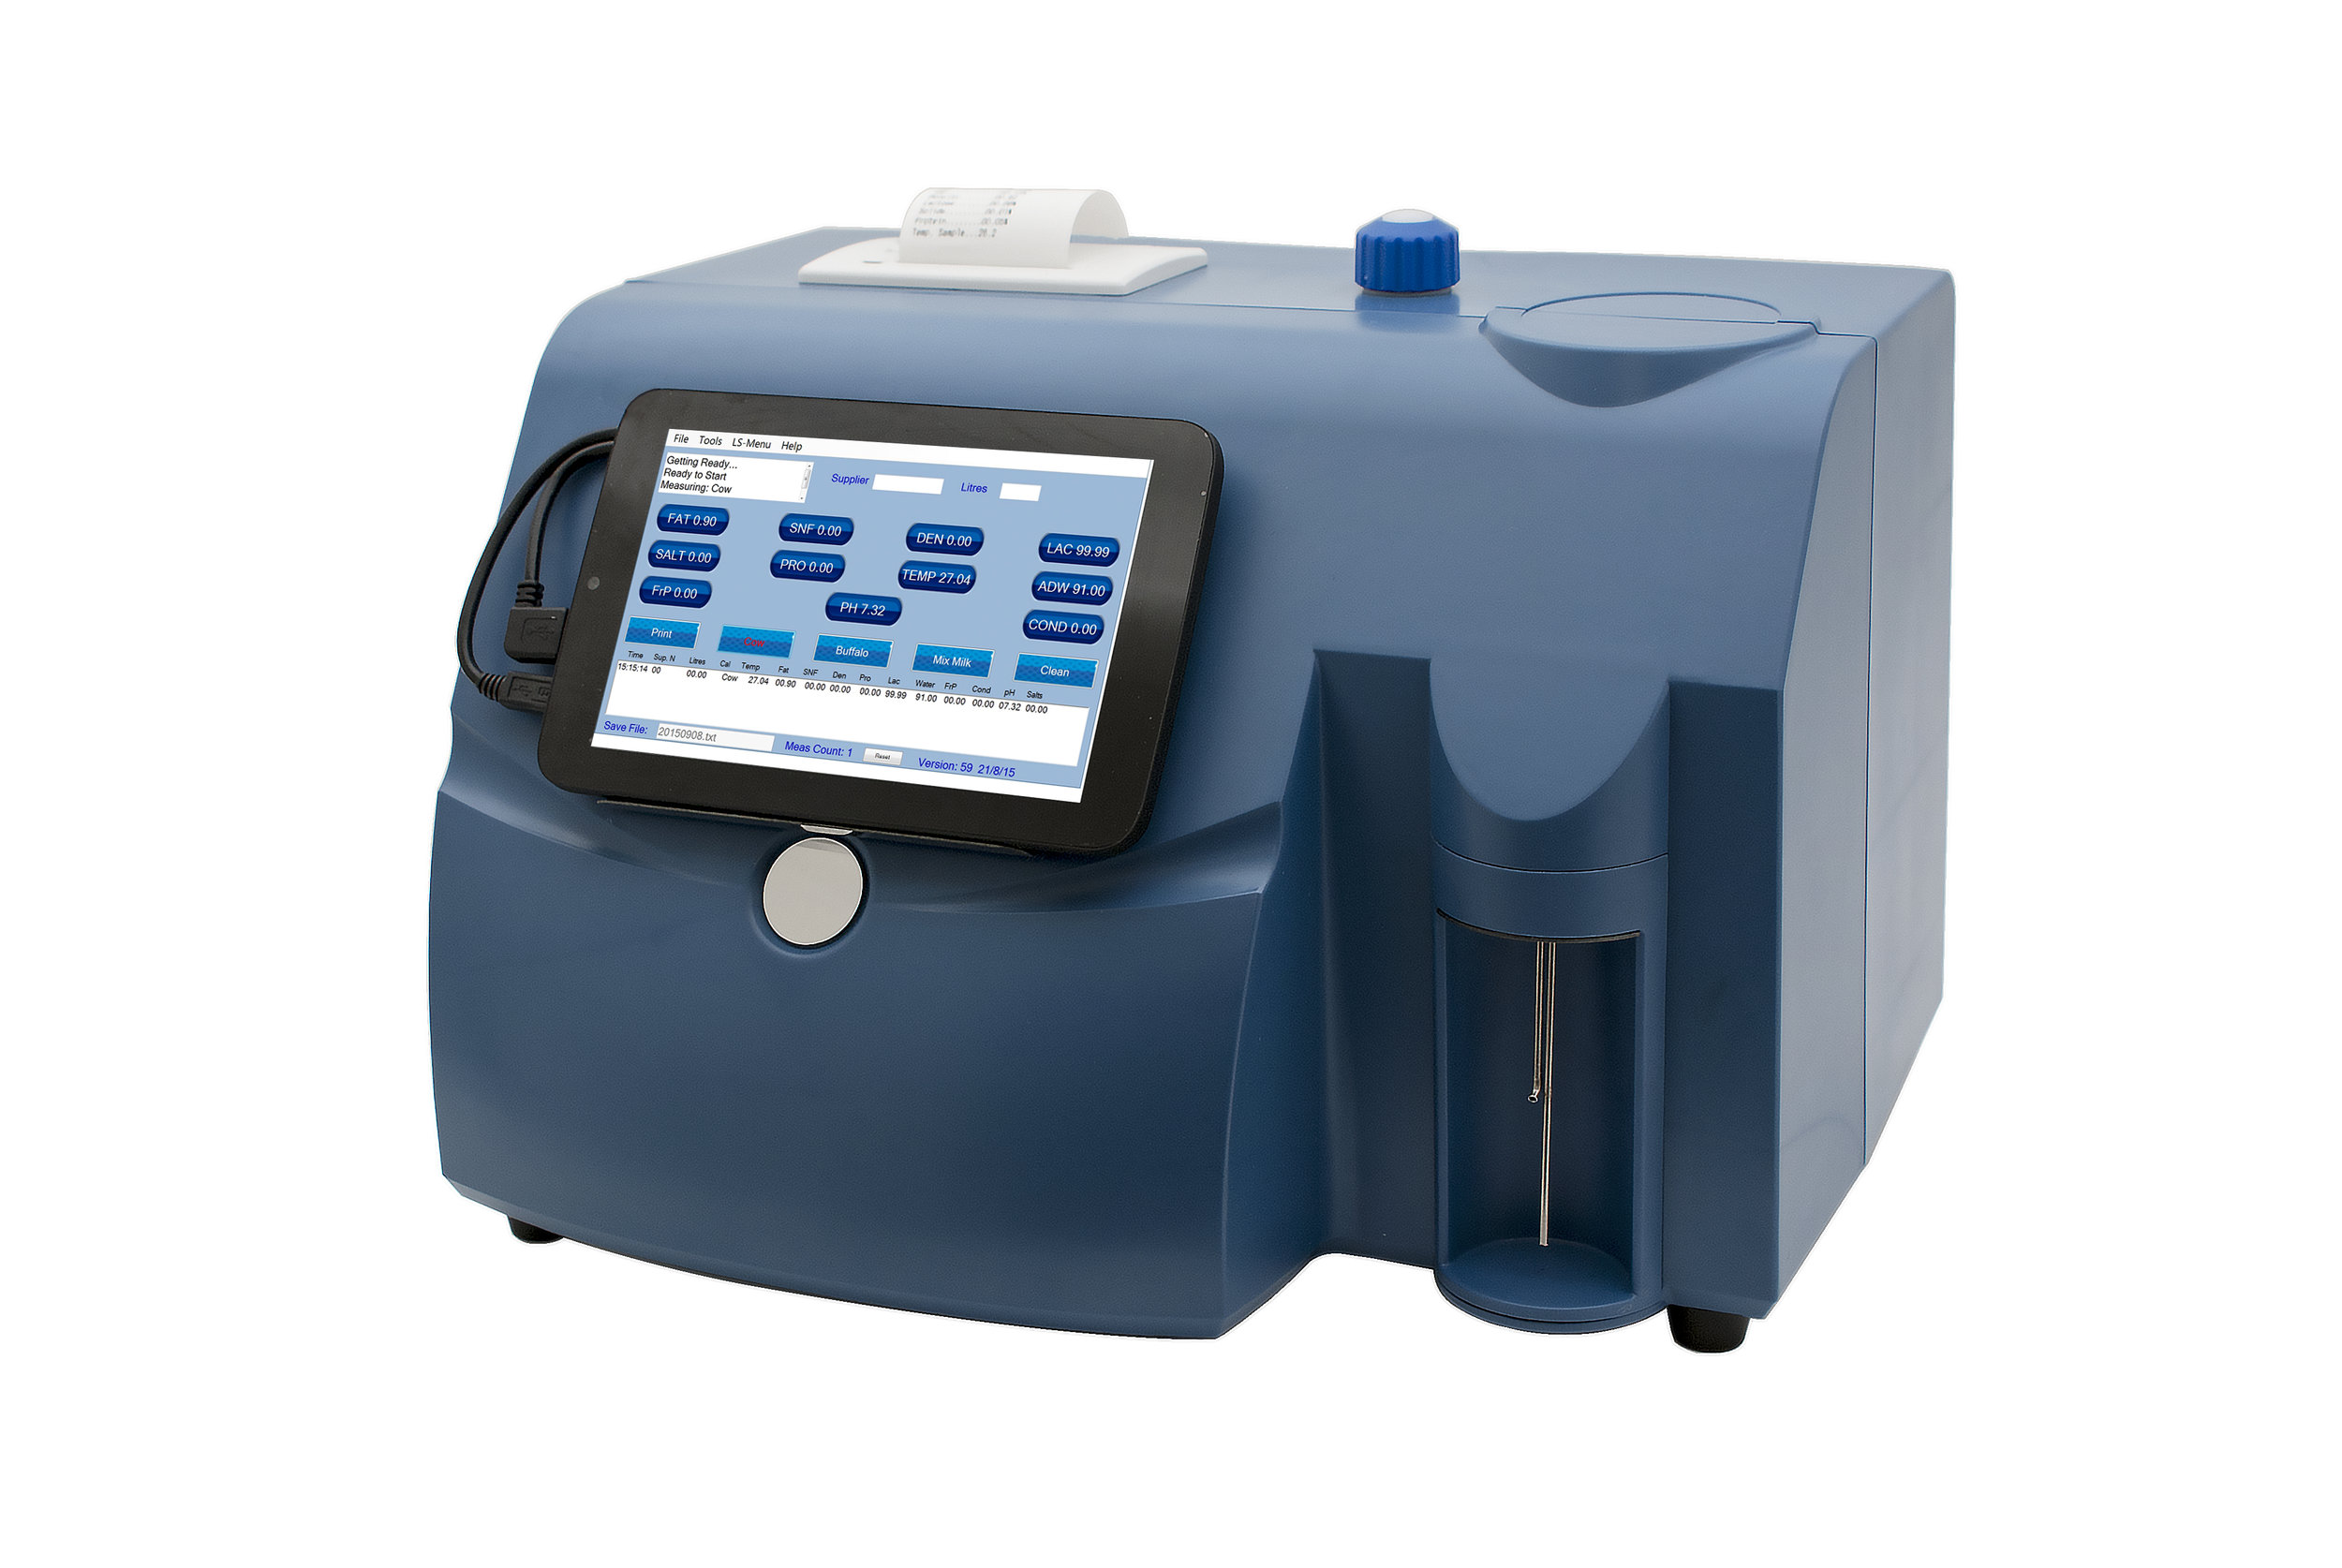 Copy of Lactoscan MCC Milk Analyser